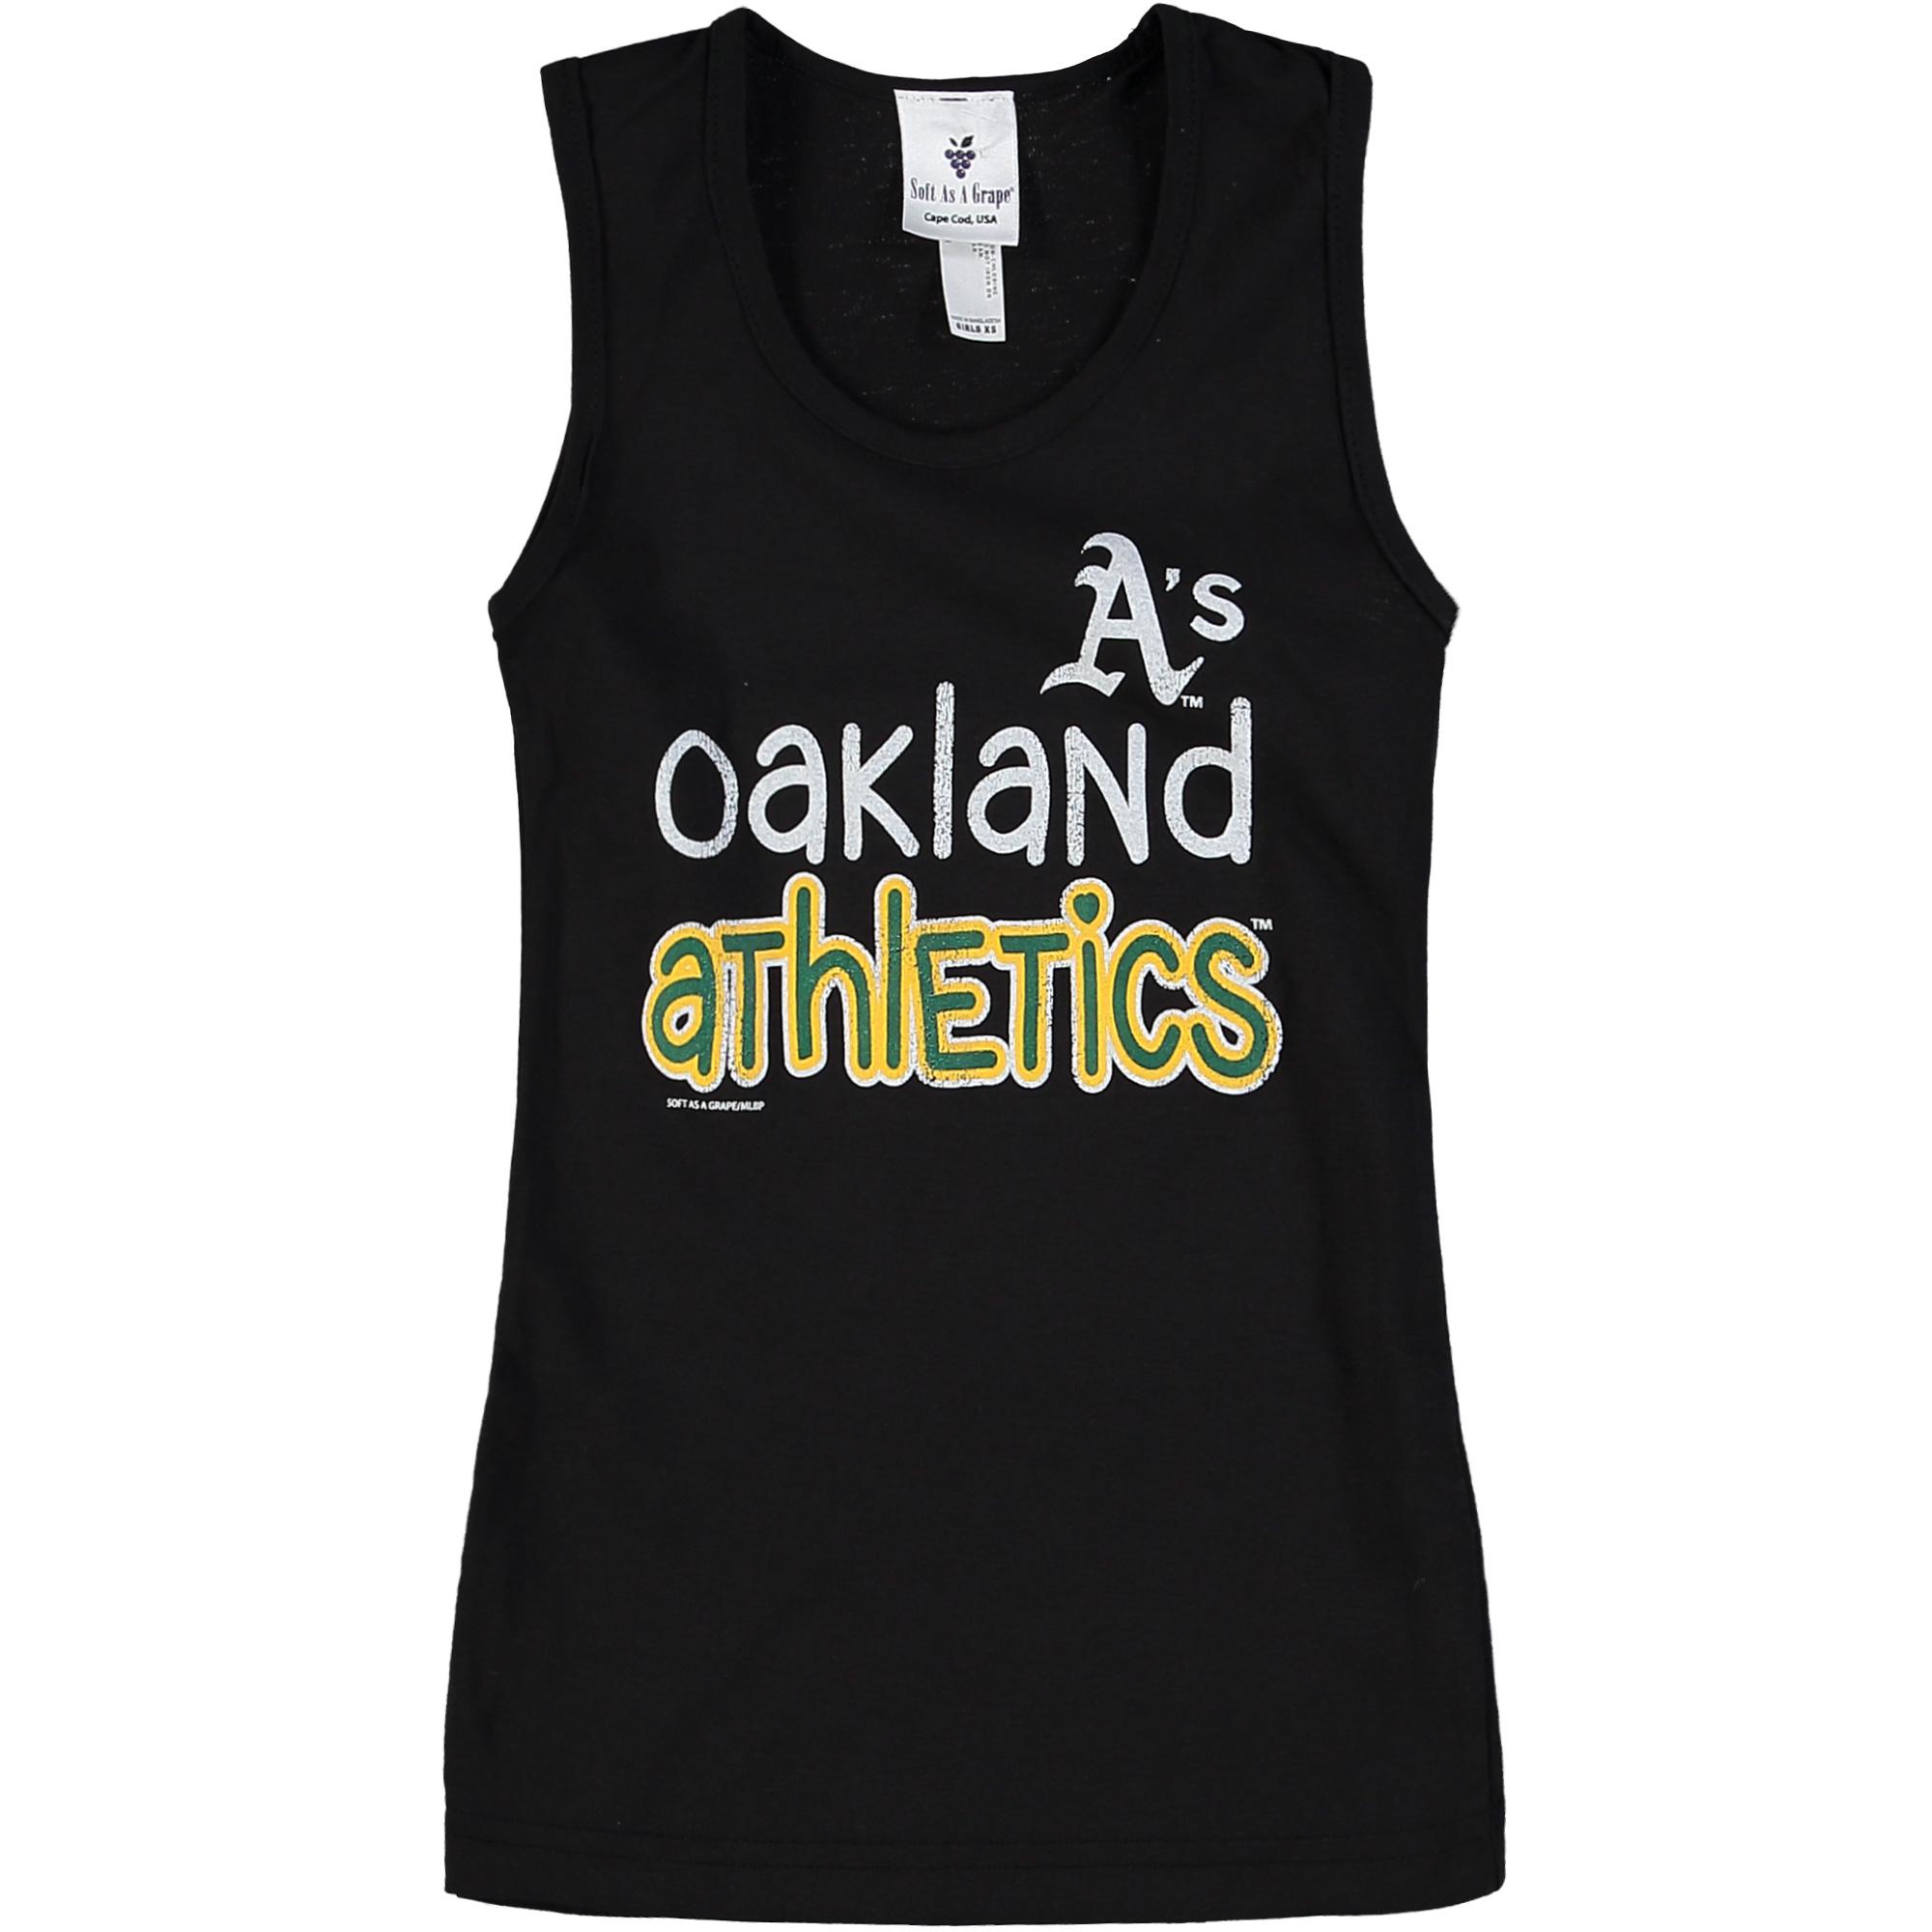 Oakland Athletics Soft as a Grape Girls Youth Curveball Tank Top - Black